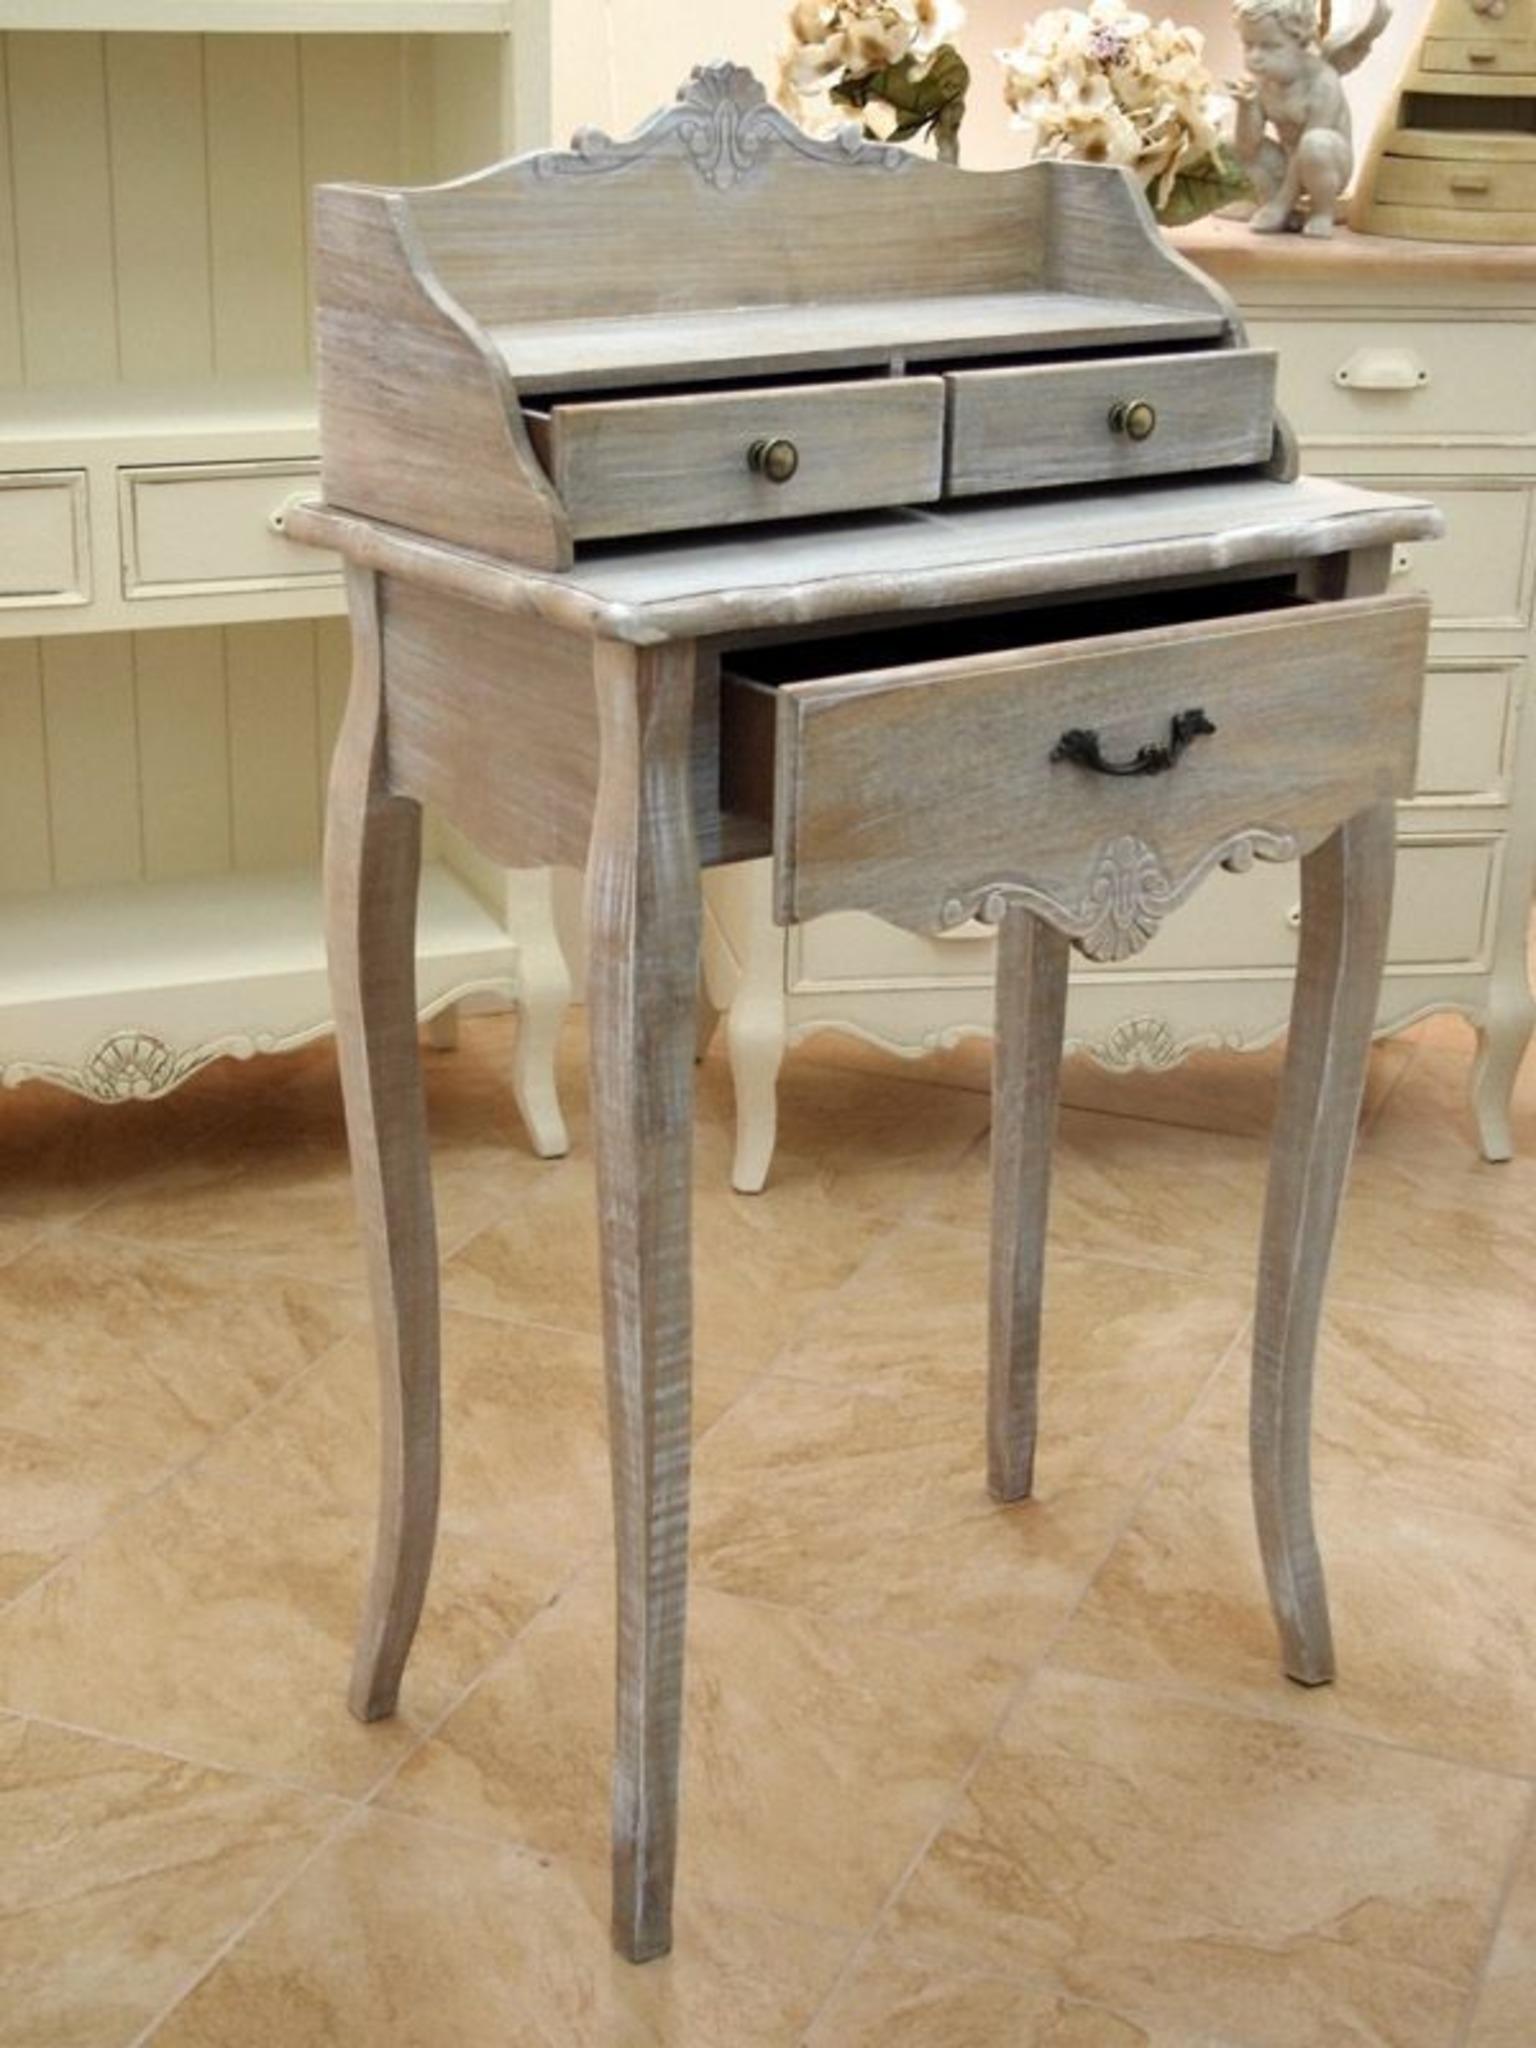 Hervorragend Aus neu mach alt: Möbel im Vintage-Look - Josefstadt KE77